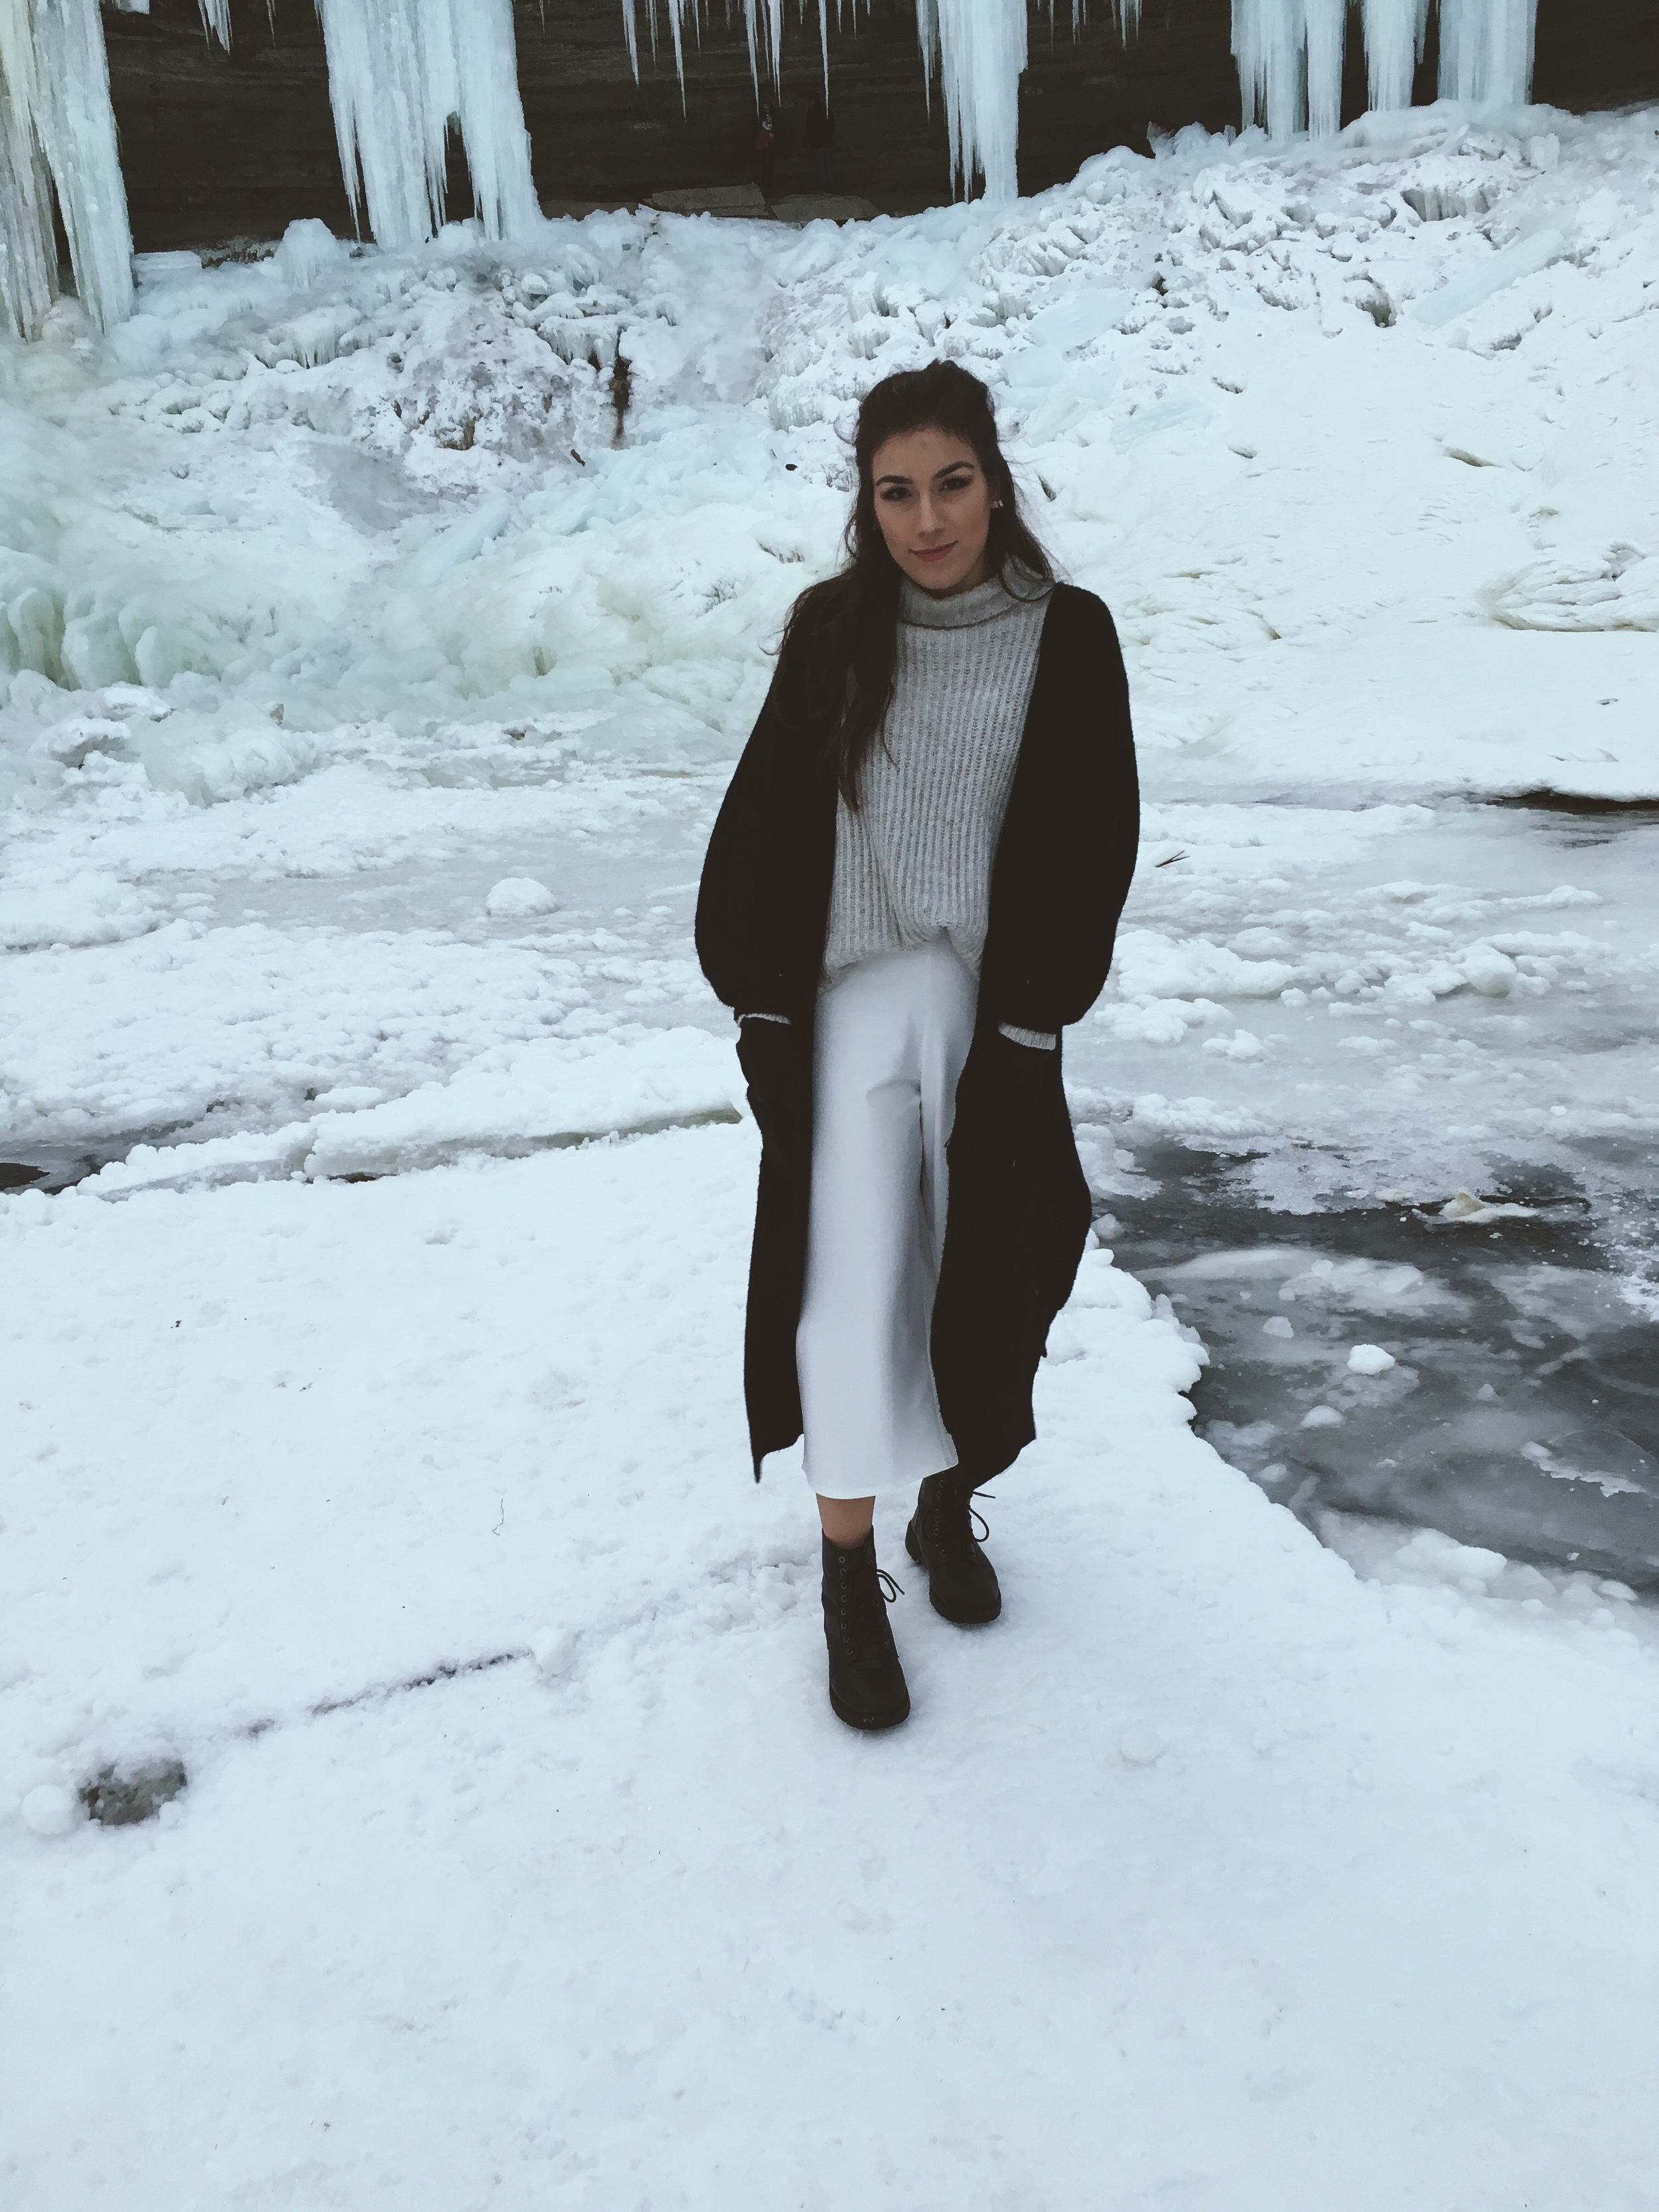 TaylorKnox_Waterfalls4